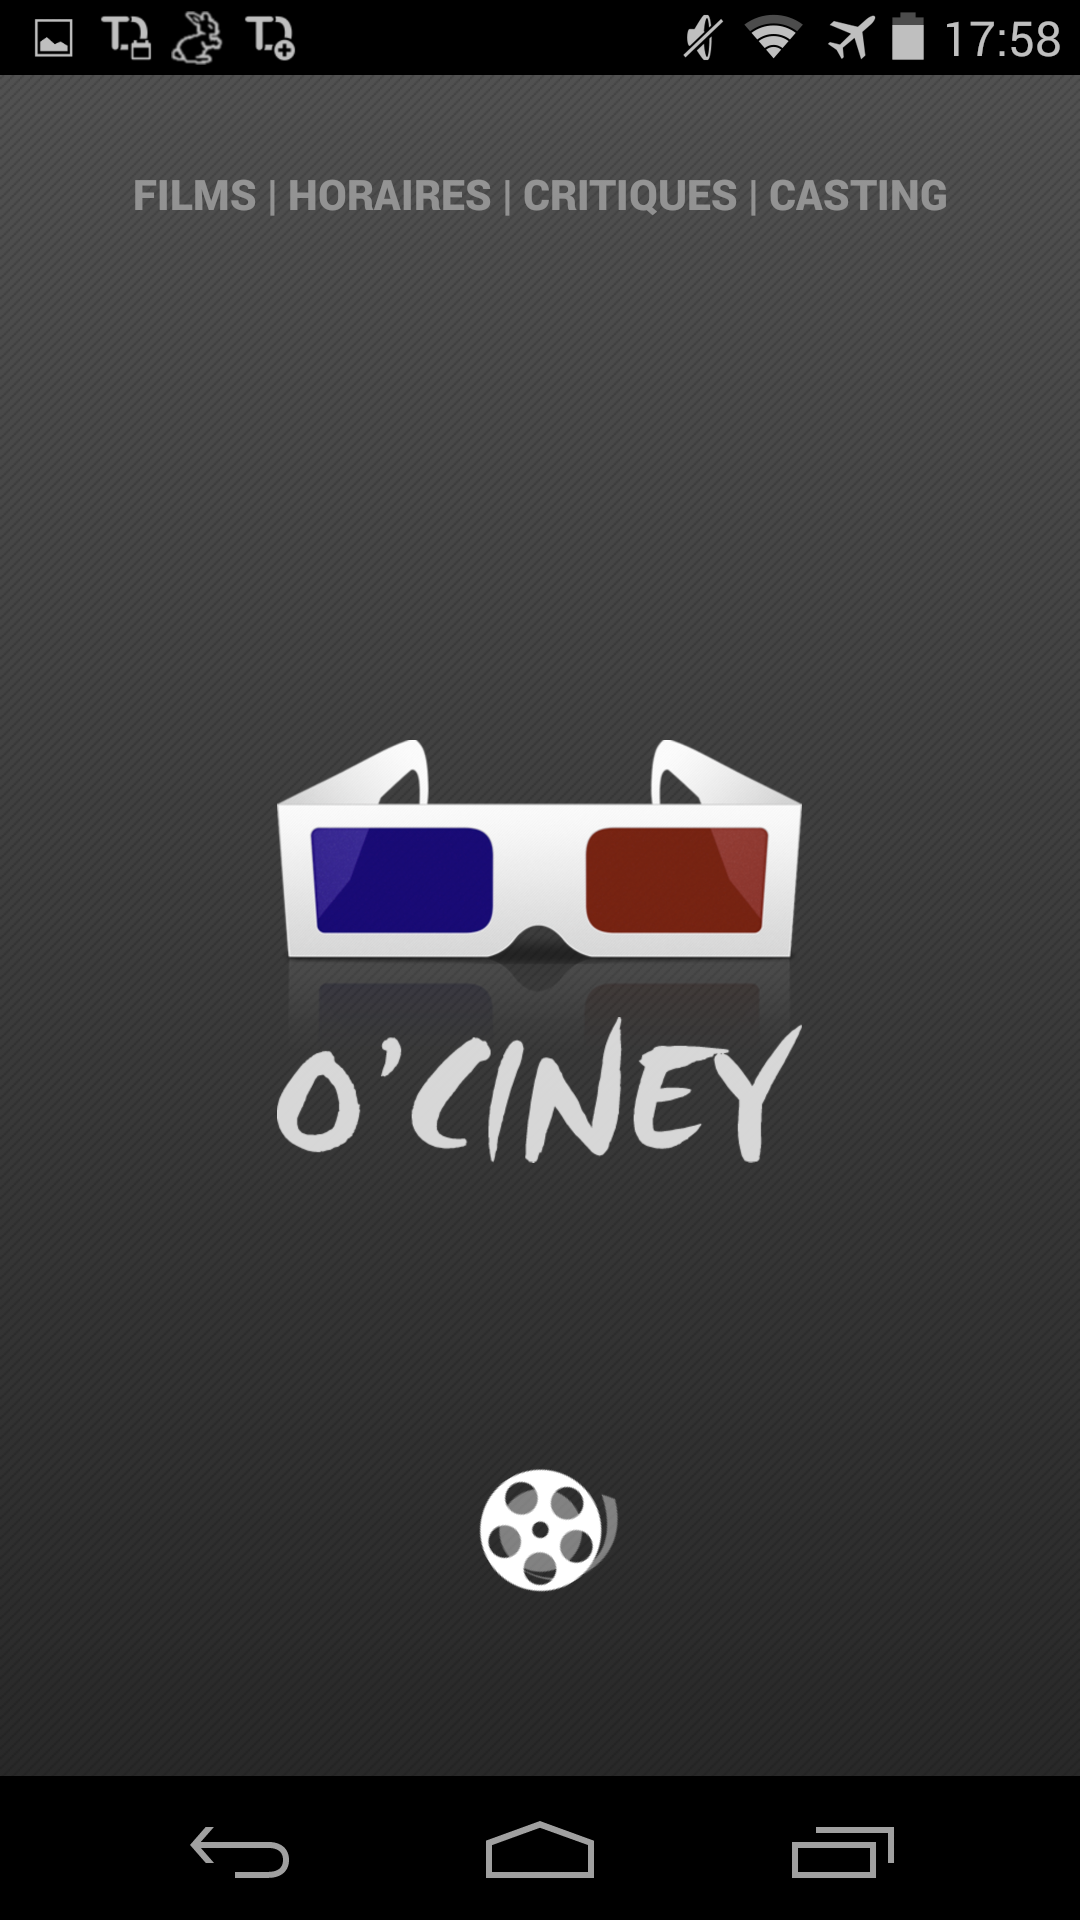 O'ciney